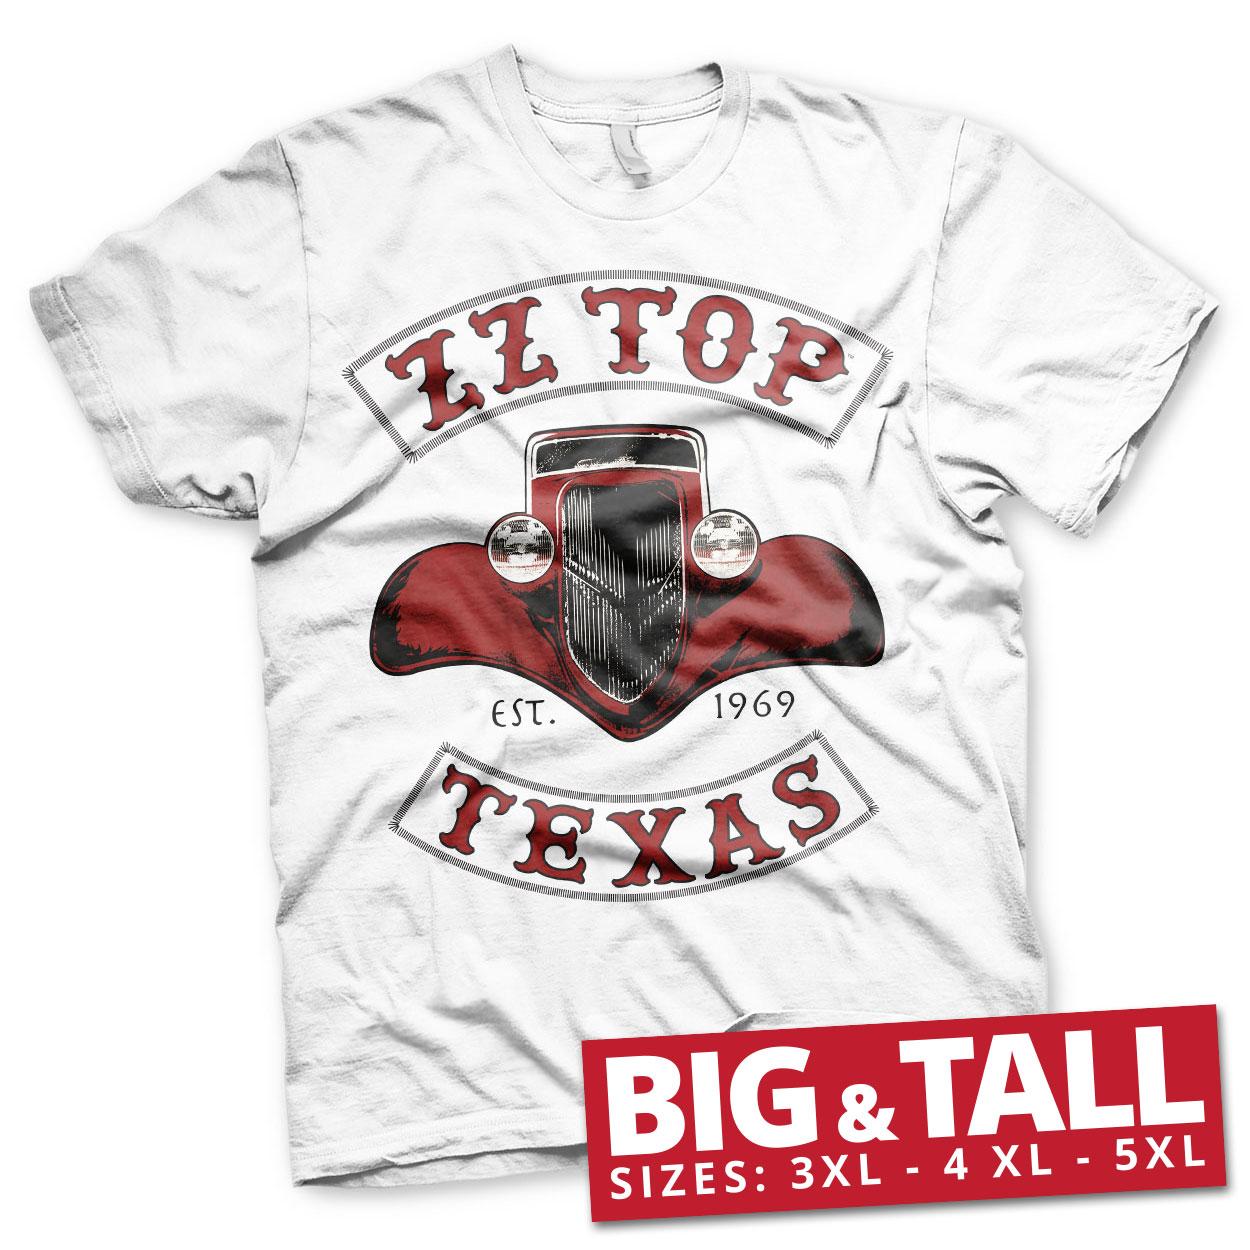 ZZ-Top - Texas 1969 Big & Tall T-Shirt